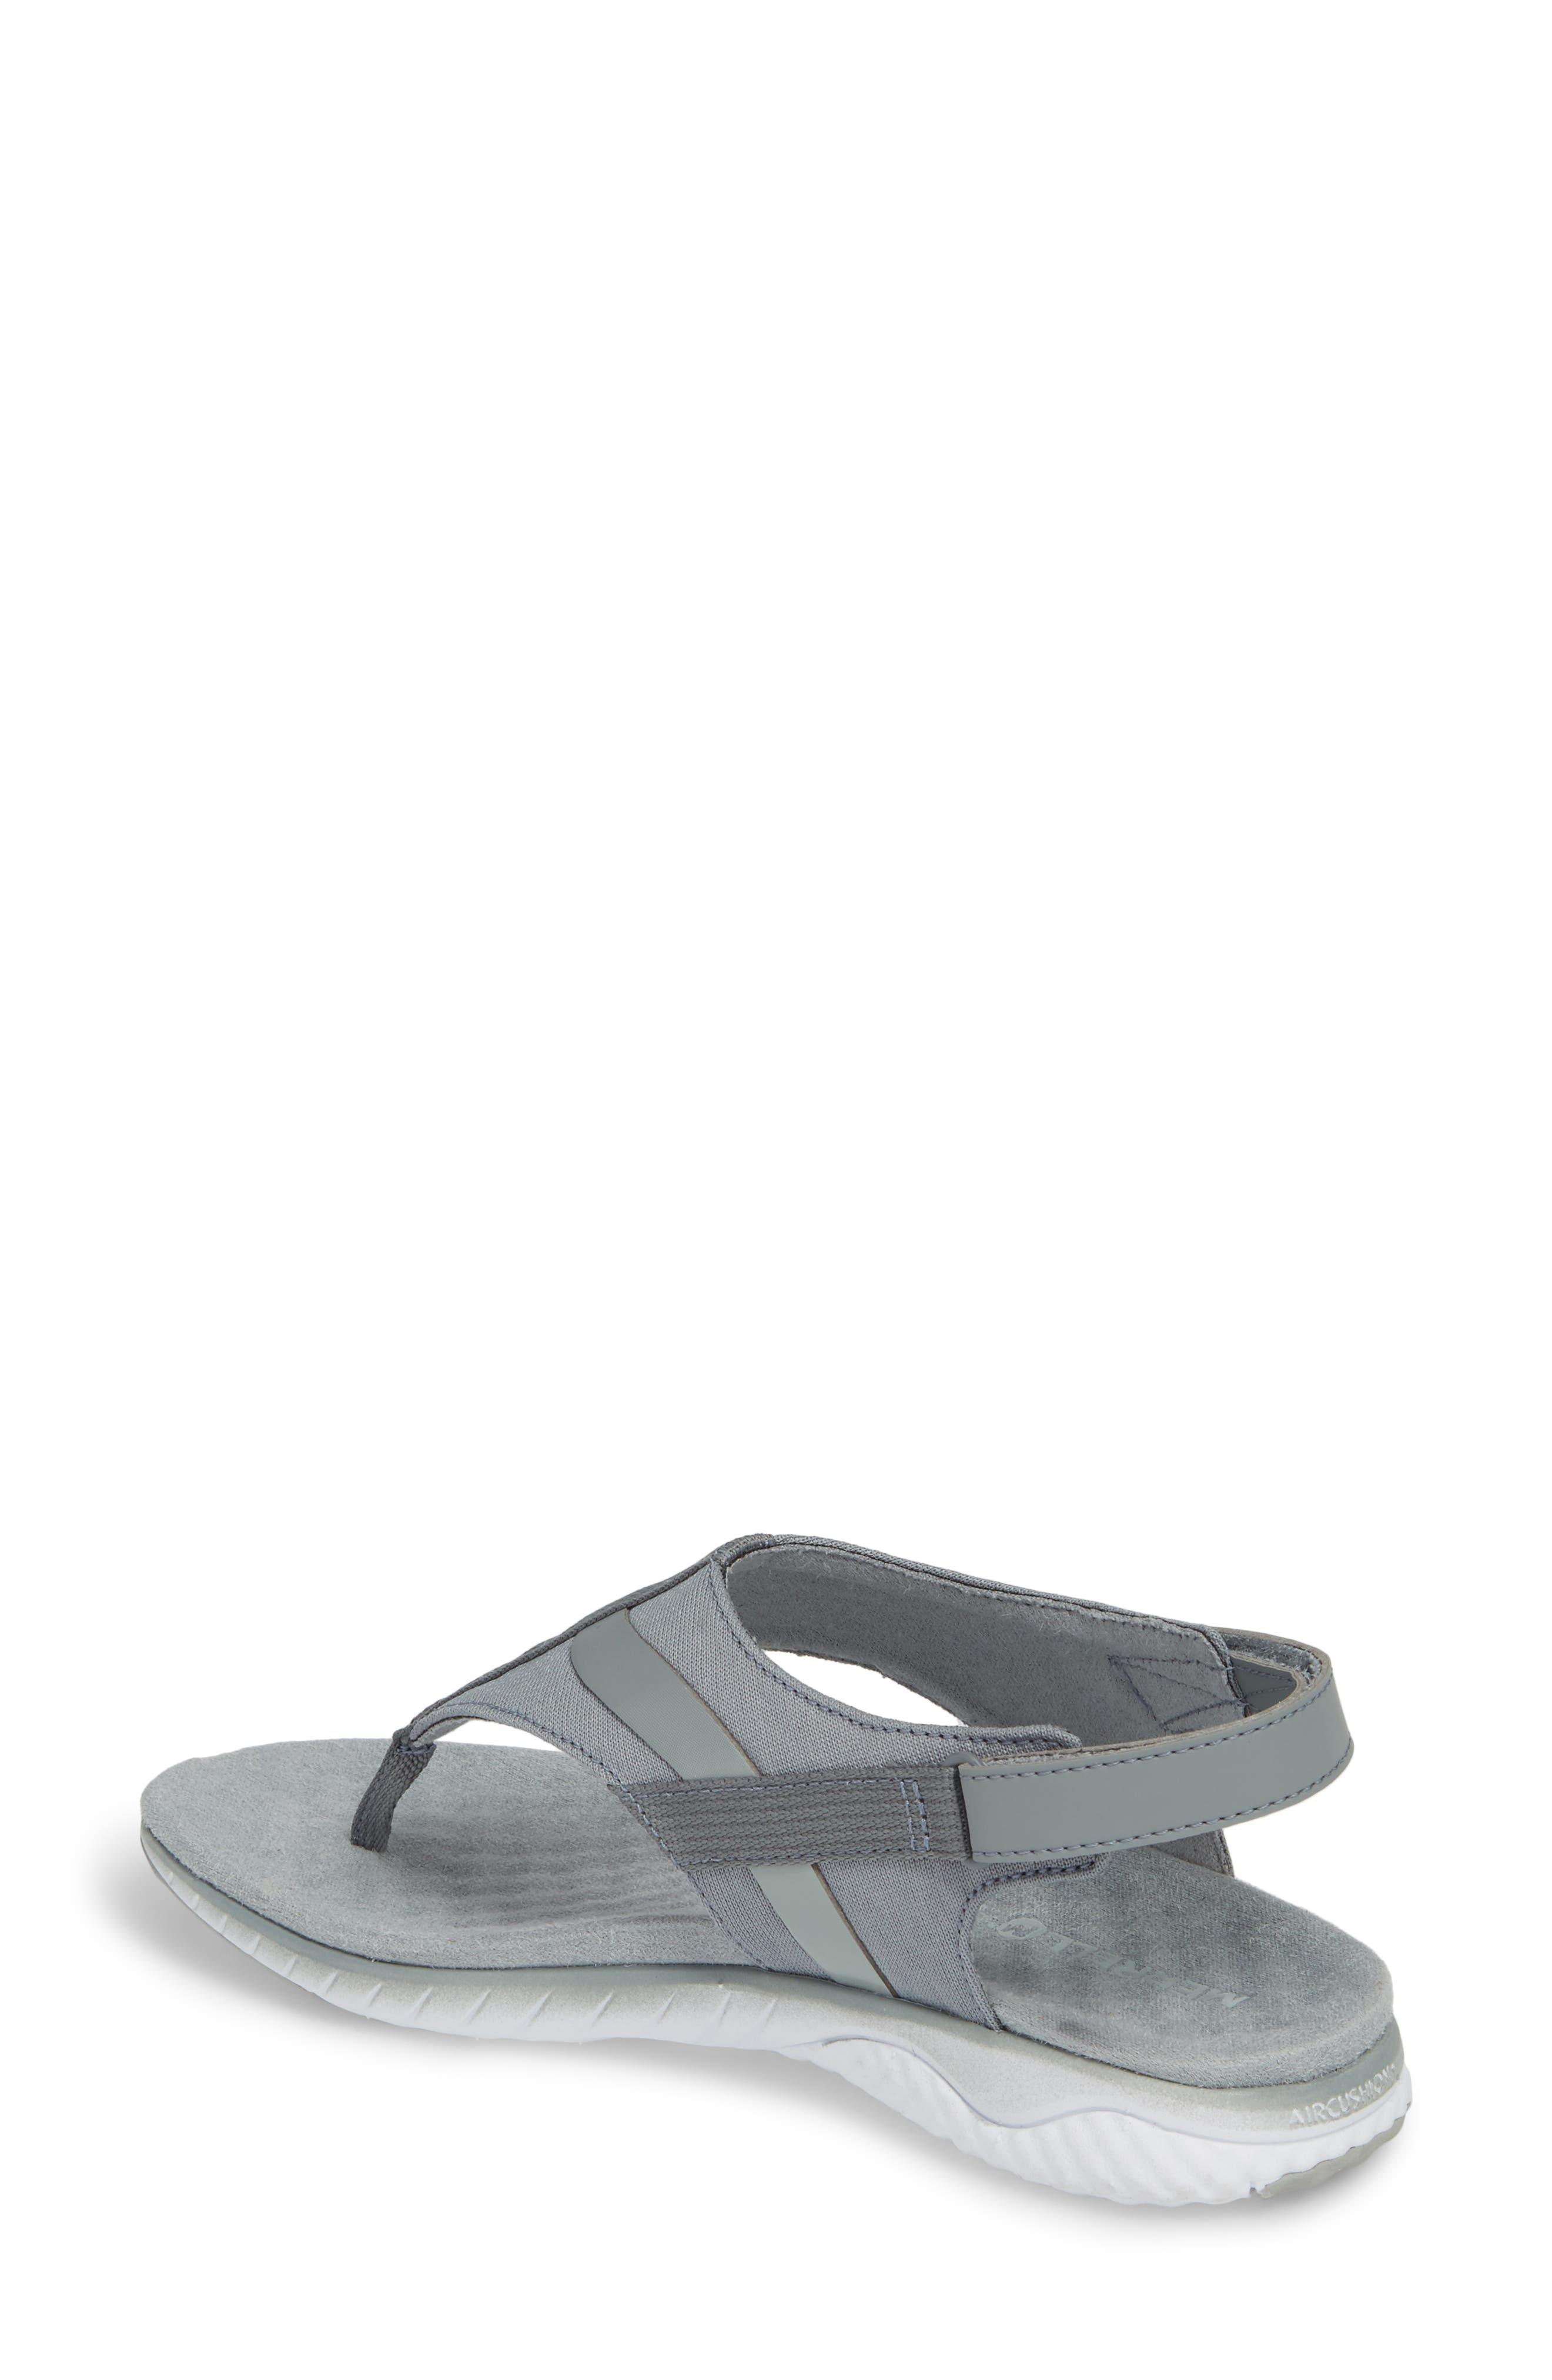 1SIX8 Linna Slide Air Cushion+ Sandal,                             Alternate thumbnail 6, color,